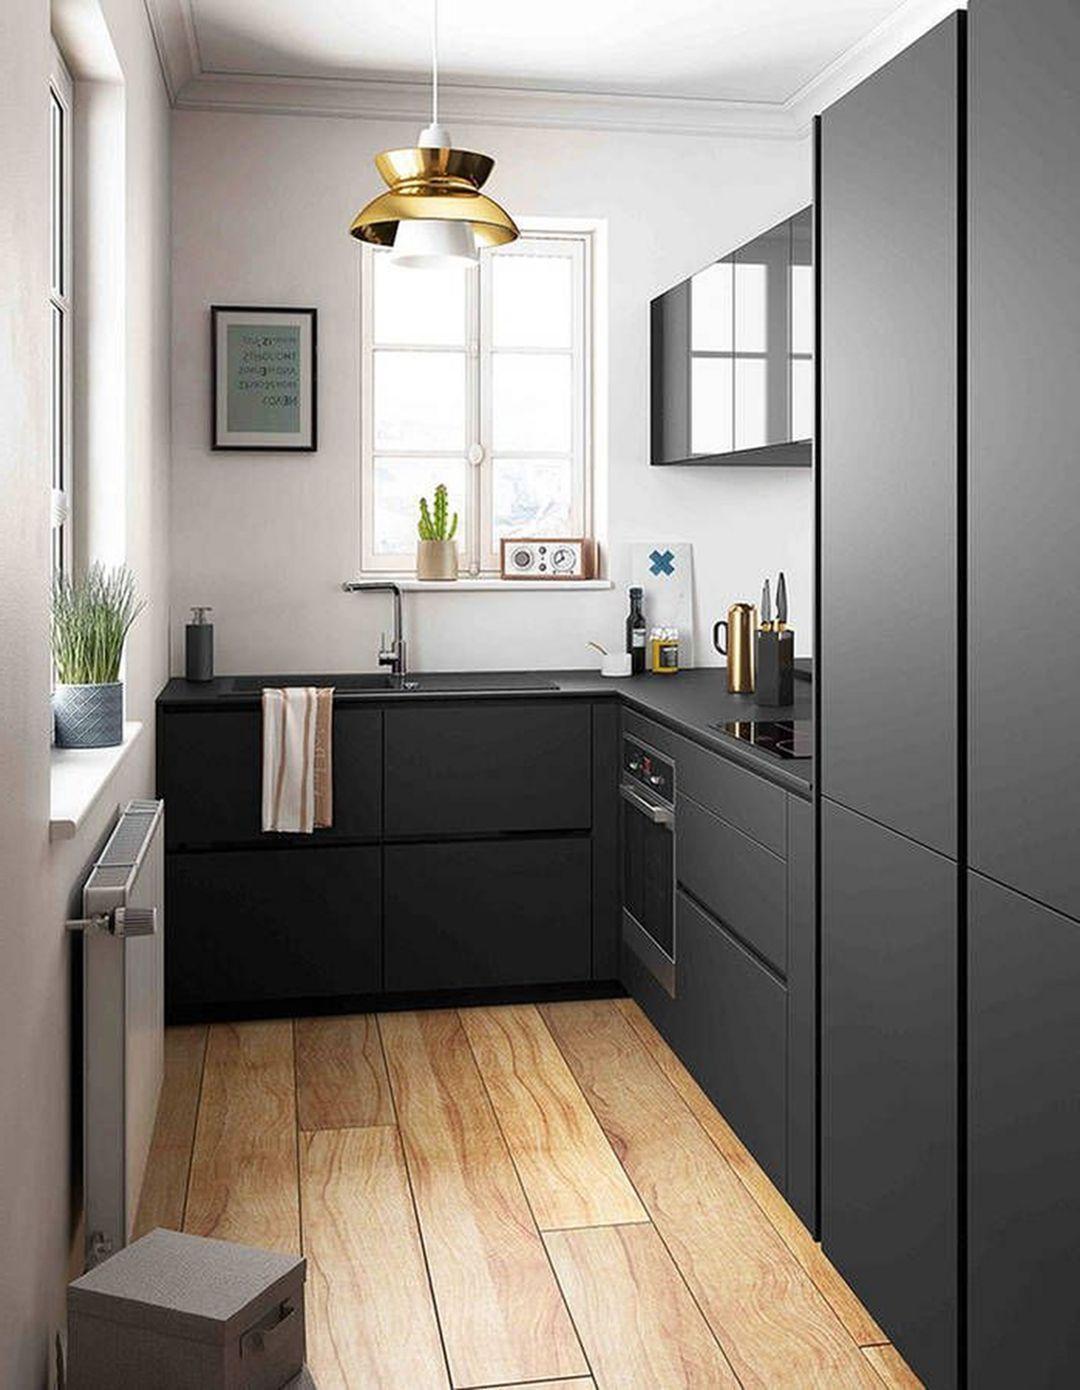 Small Kitchen Designs 2020